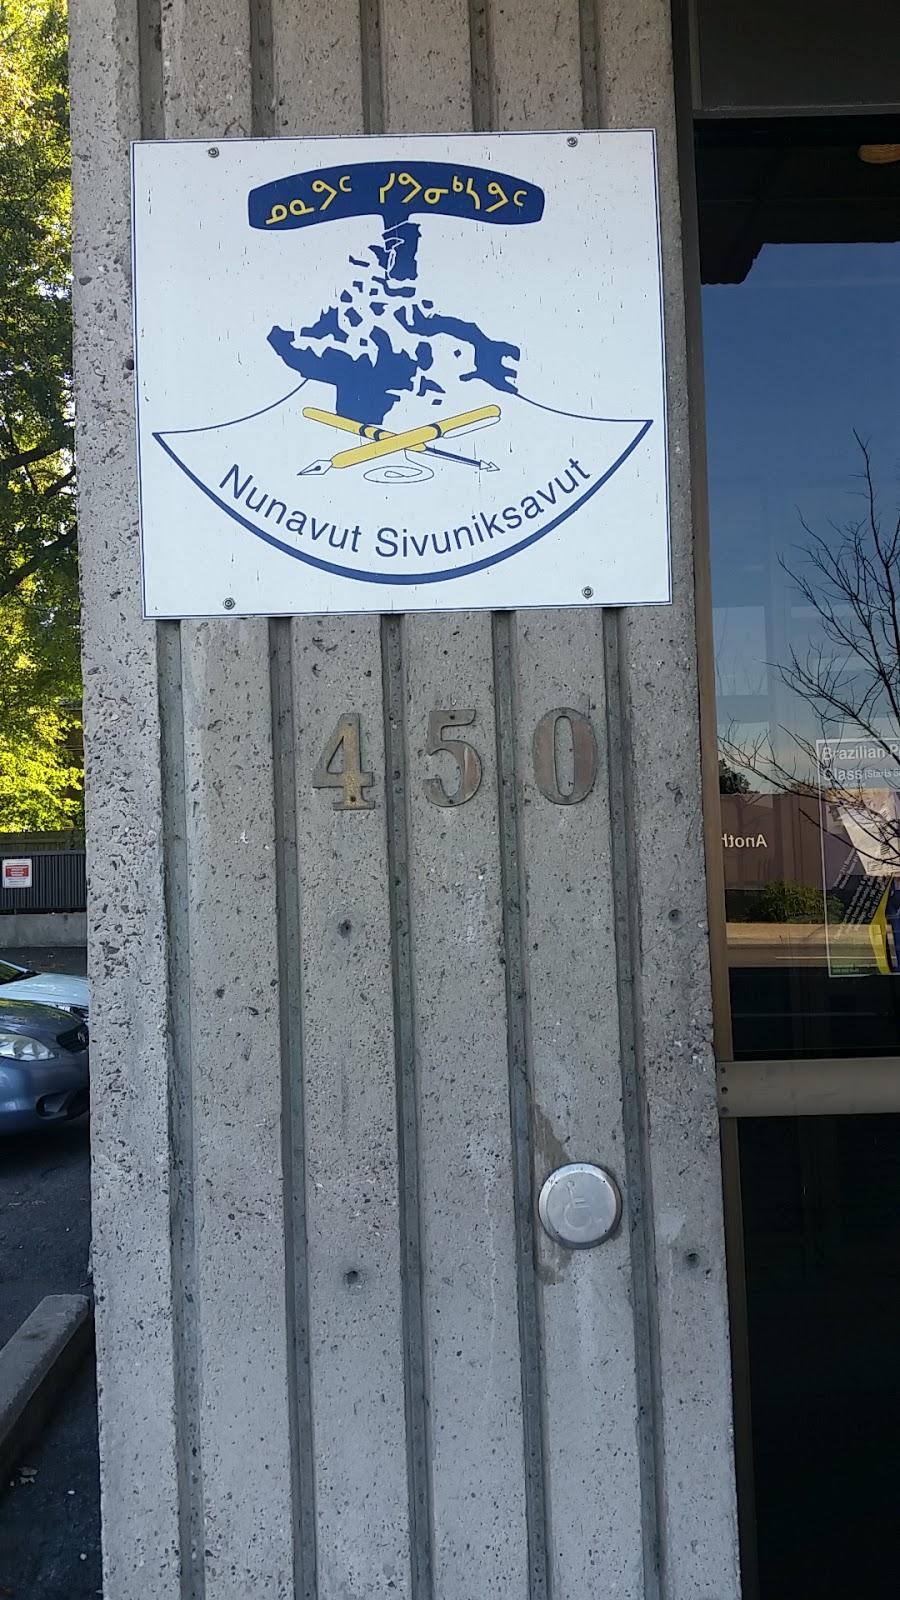 Nunavut Sivuniksavut | university | 450 Rideau St #201, Ottawa, ON K1N 5Z4, Canada | 6132444937 OR +1 613-244-4937